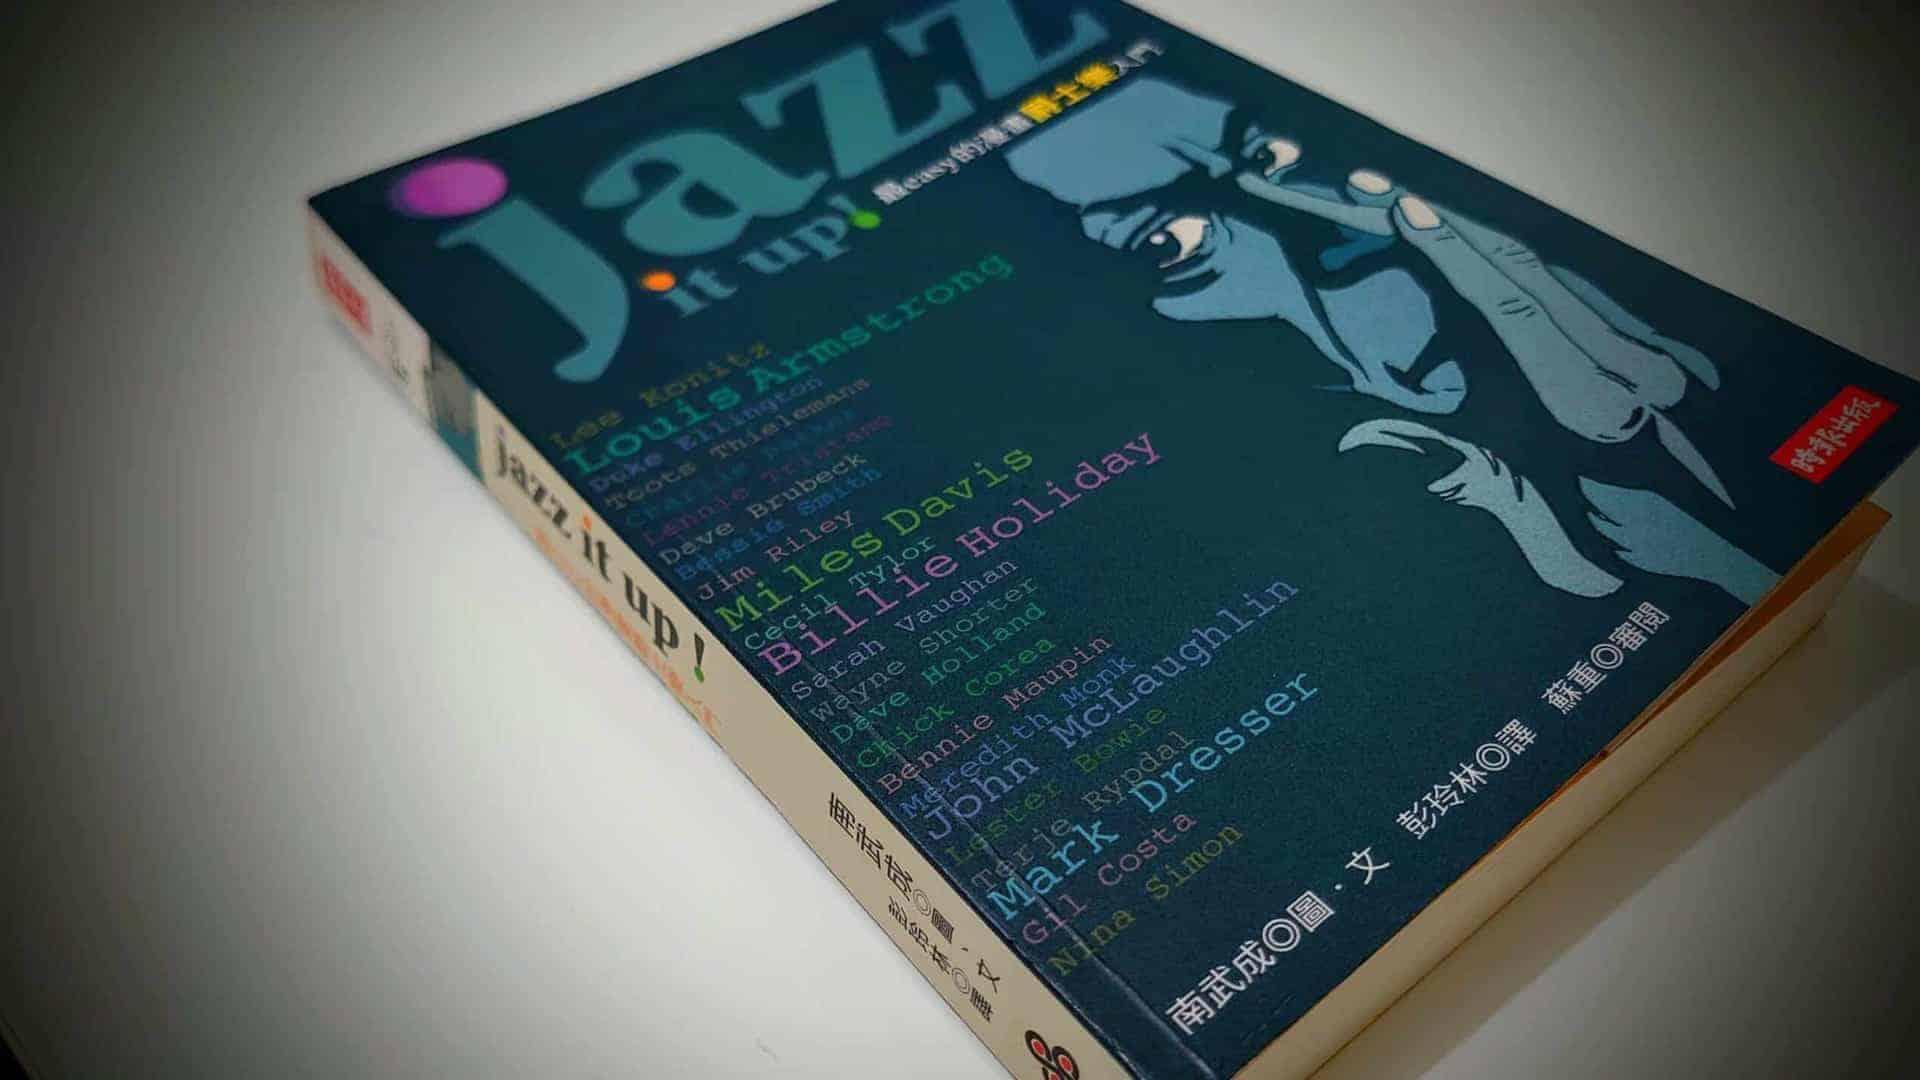 《Jazz it up! 最 easy 的漫畫爵士樂入門》